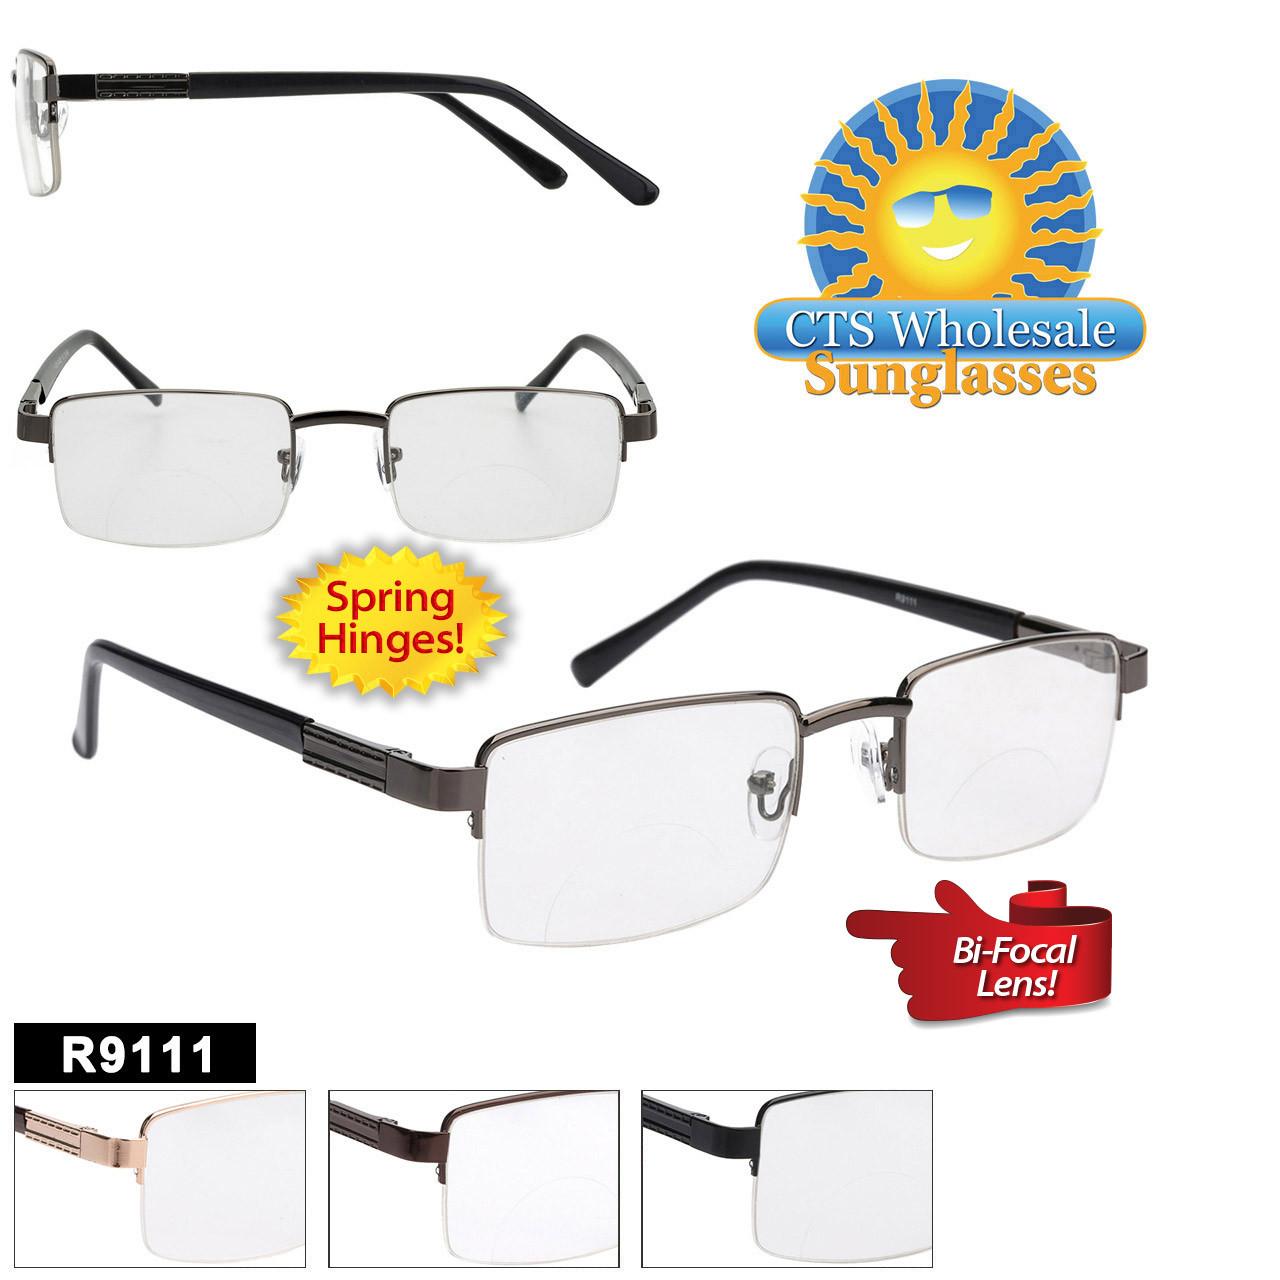 Wholesale Bi-Focal Reading Glasses - R9111 Spring Hinges!